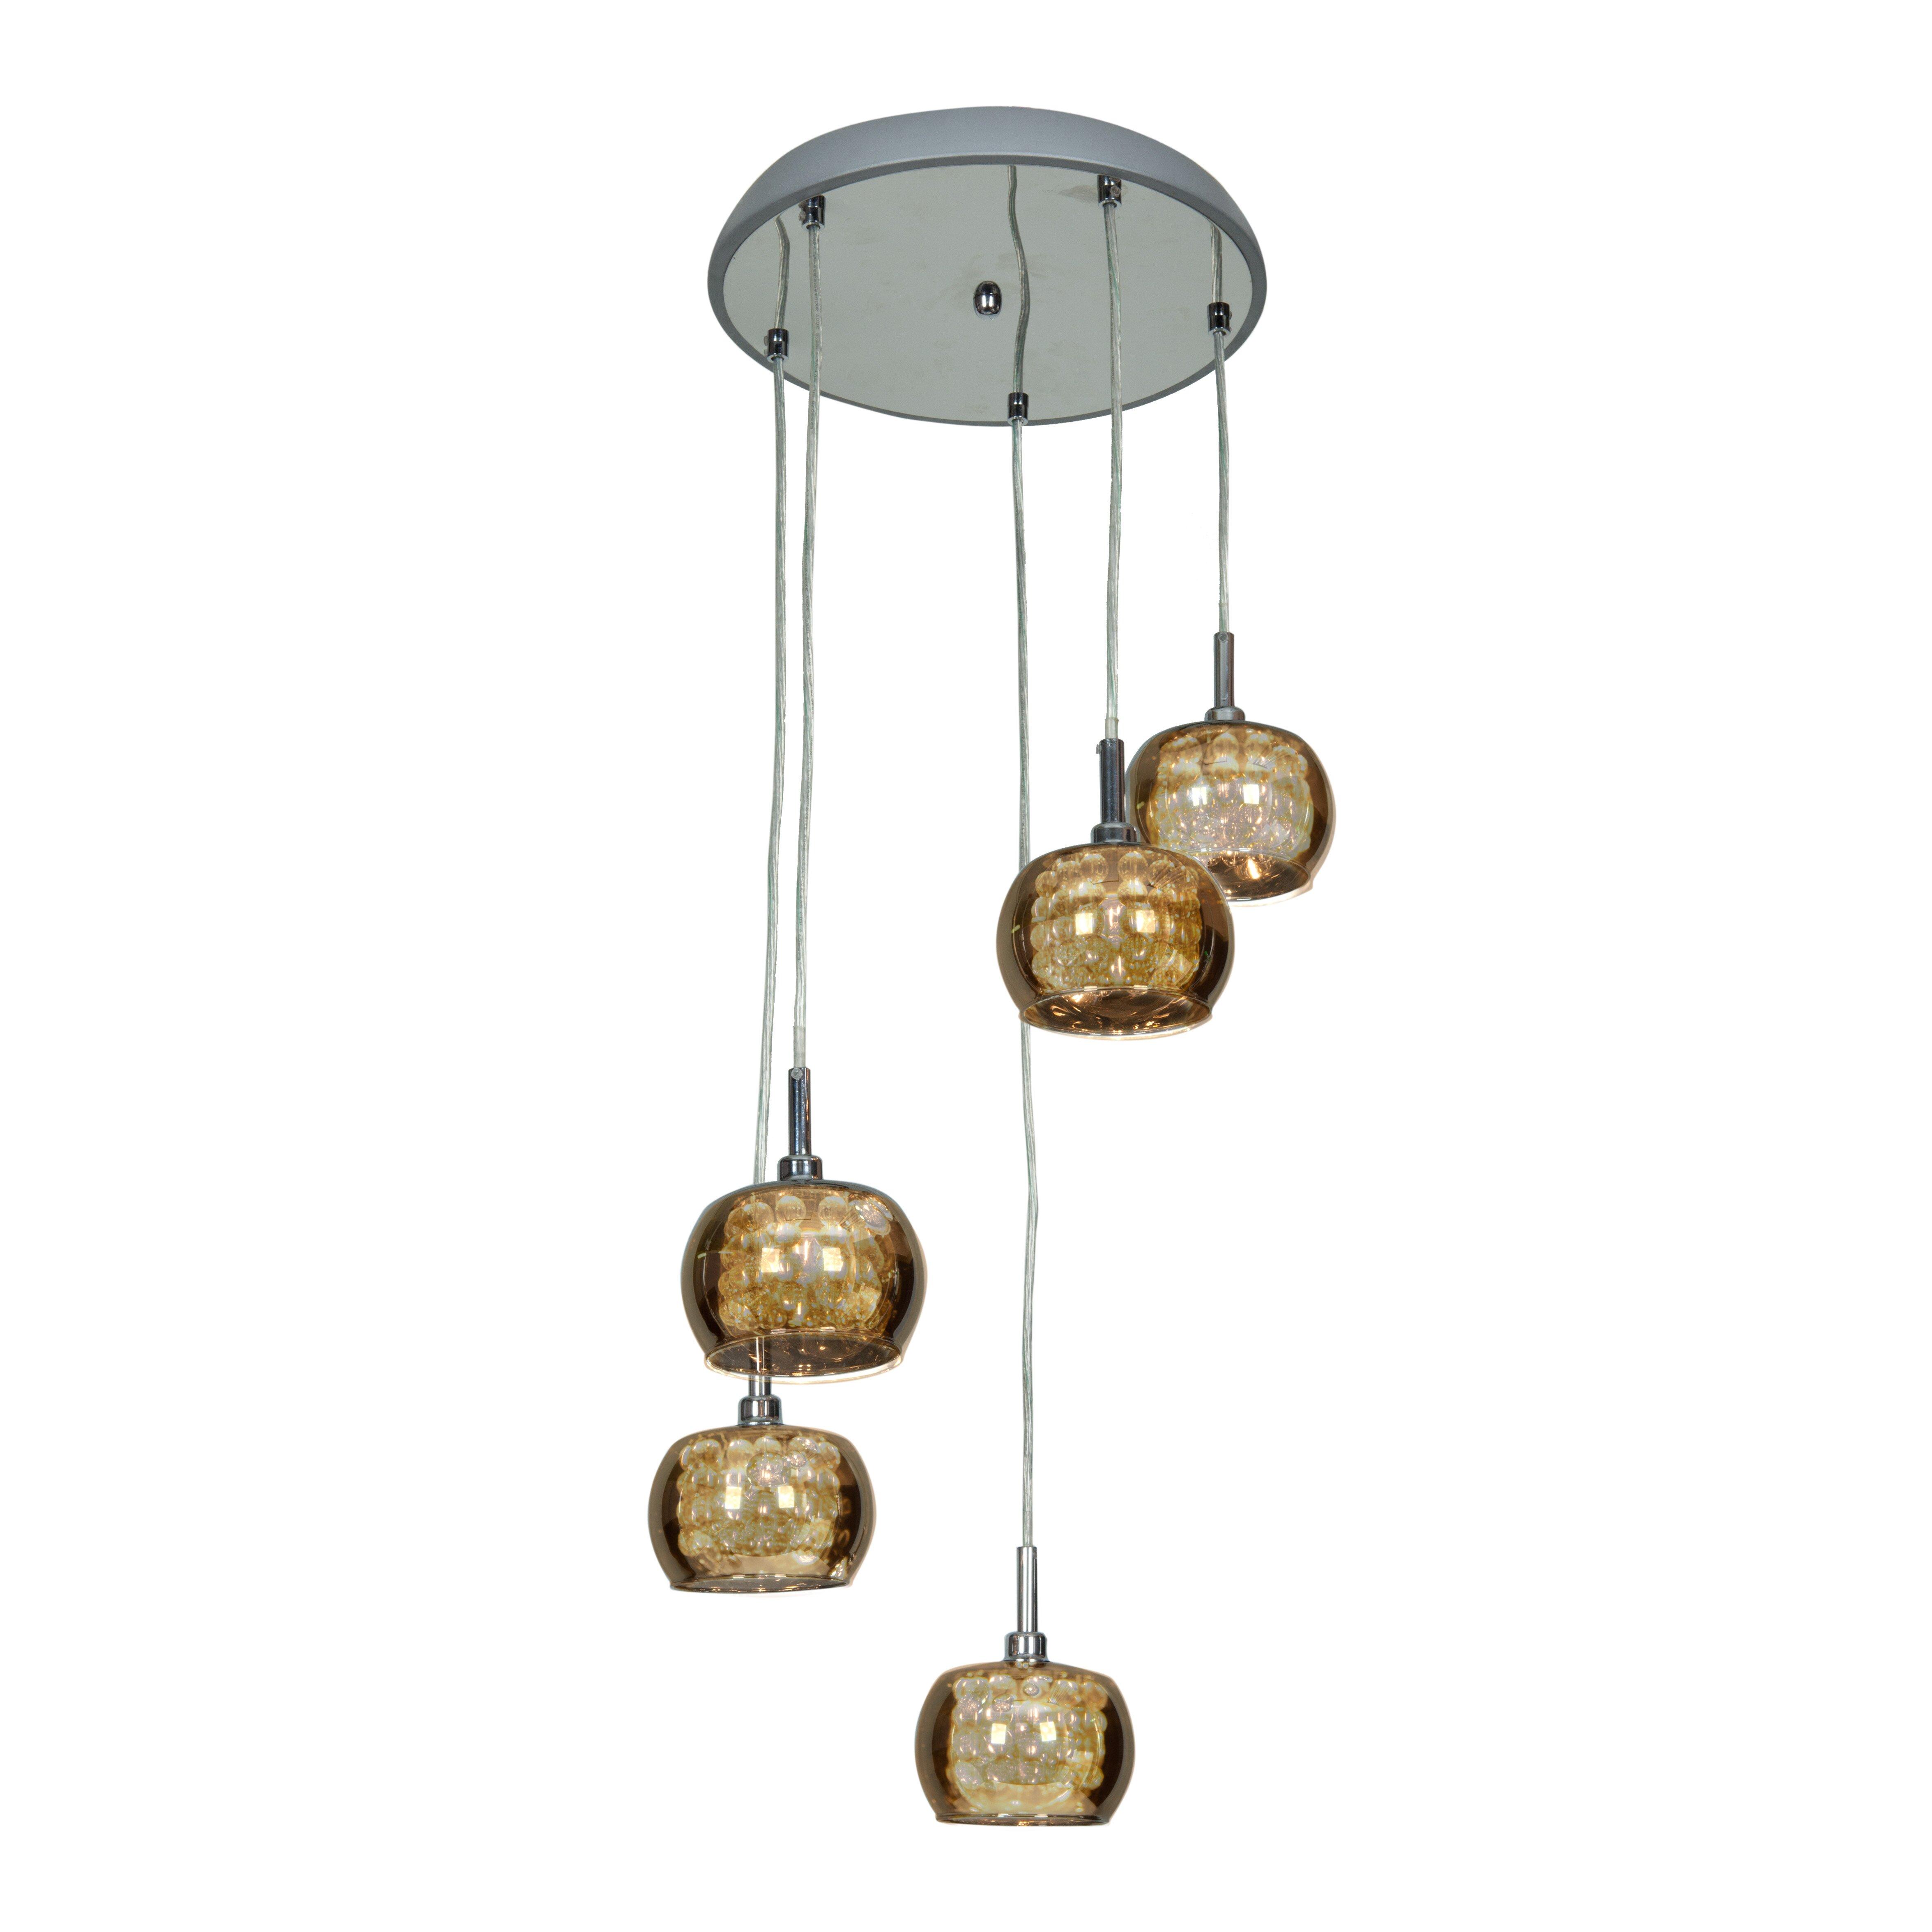 Light pendants two light shade brass e27 pendant access lighting glam 5 light pendant wayfair light pendants aloadofball Choice Image